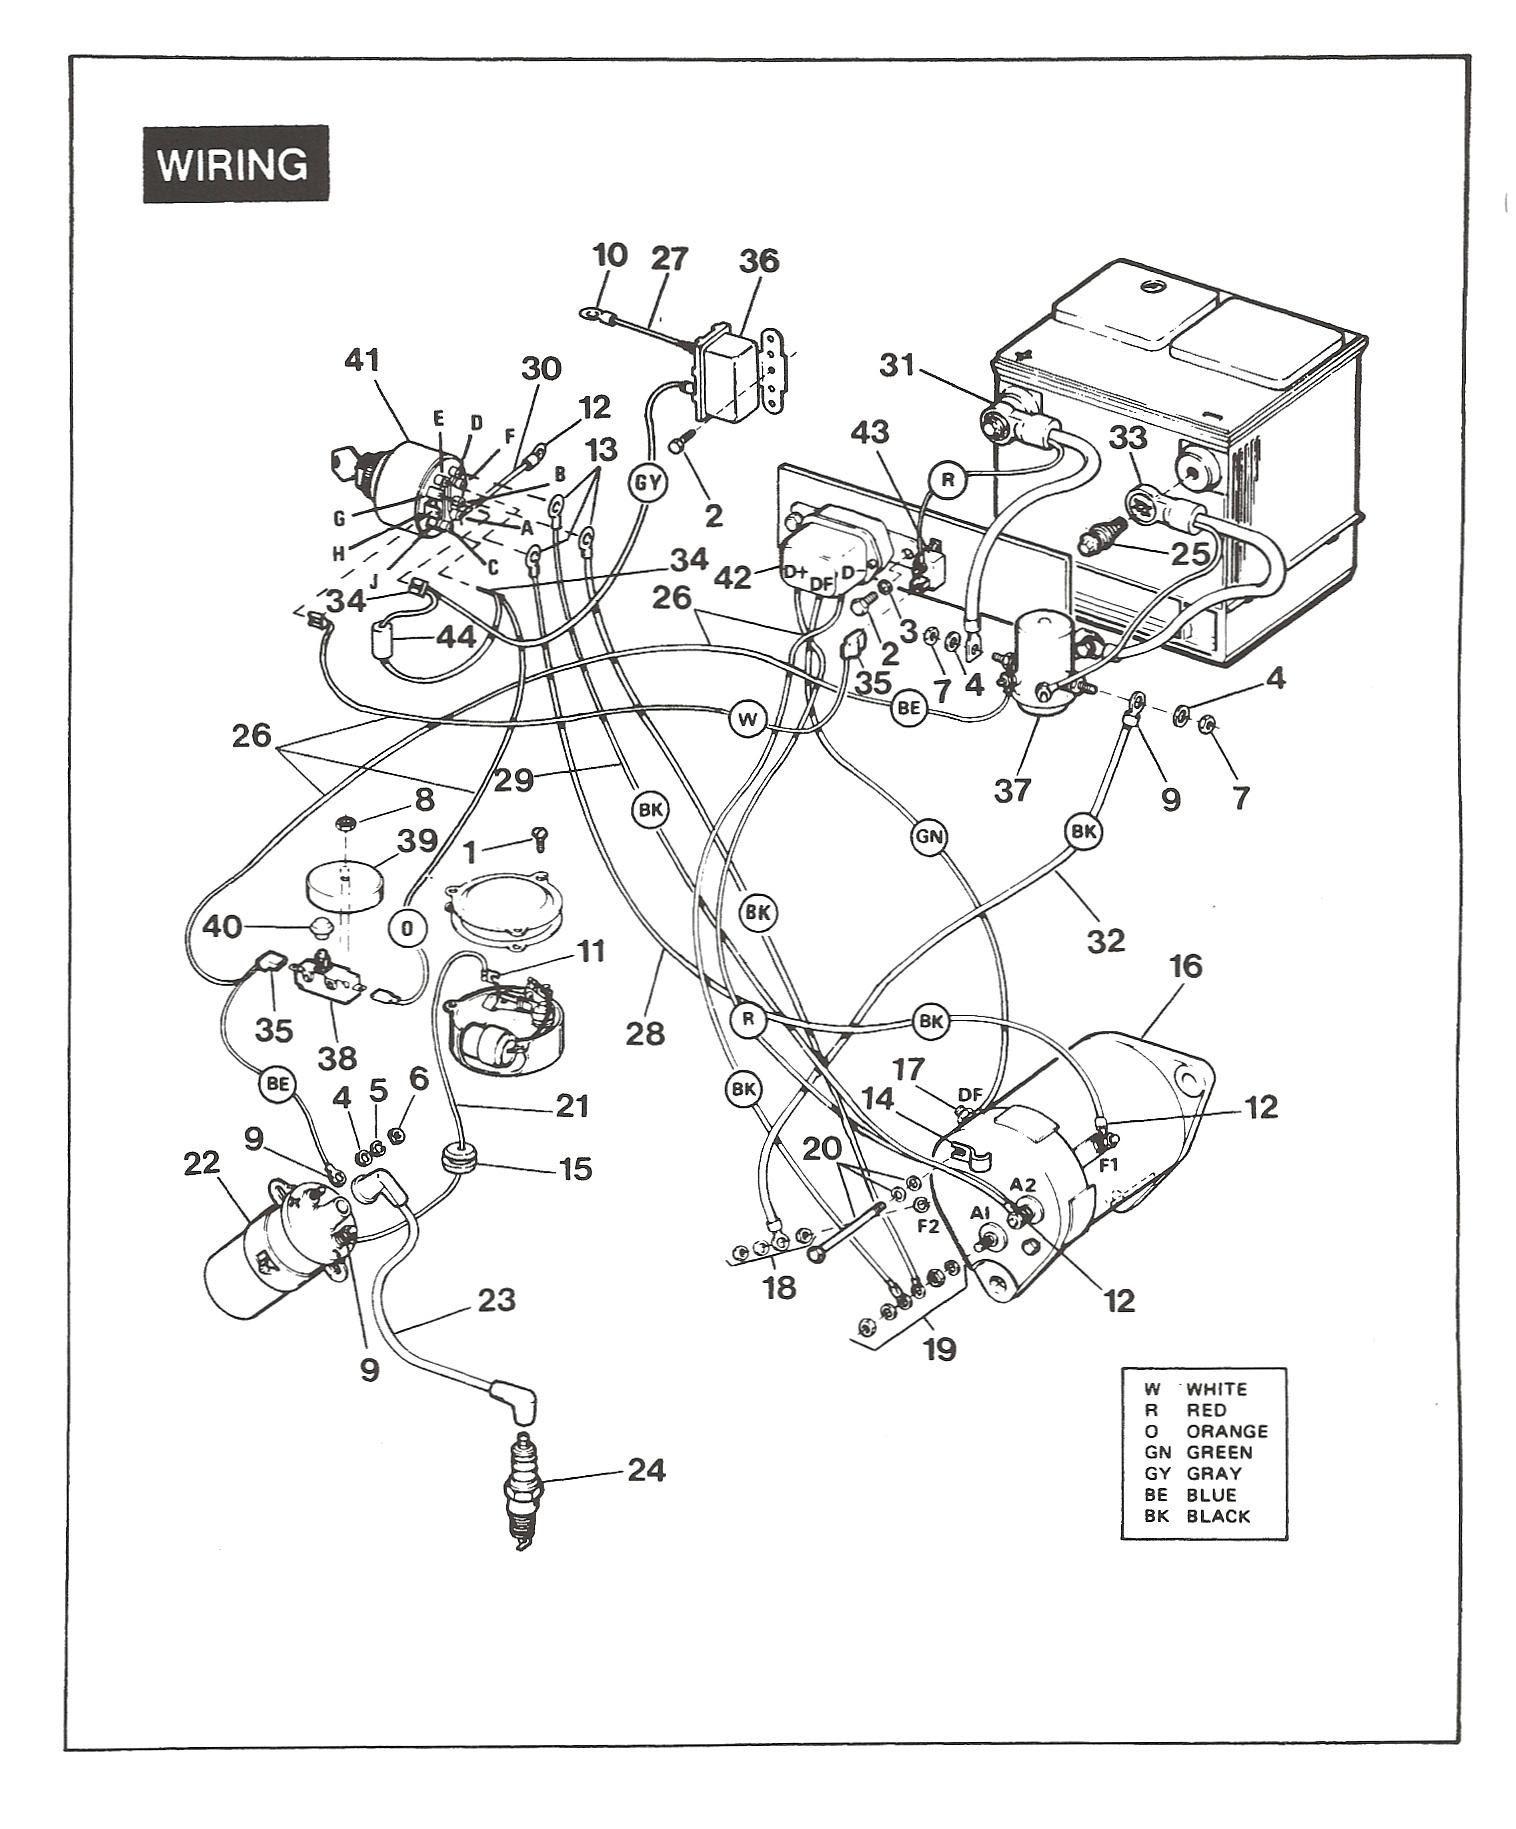 E344679 1984 Ez Go Golf Cart Wiring Diagram Wiring Library